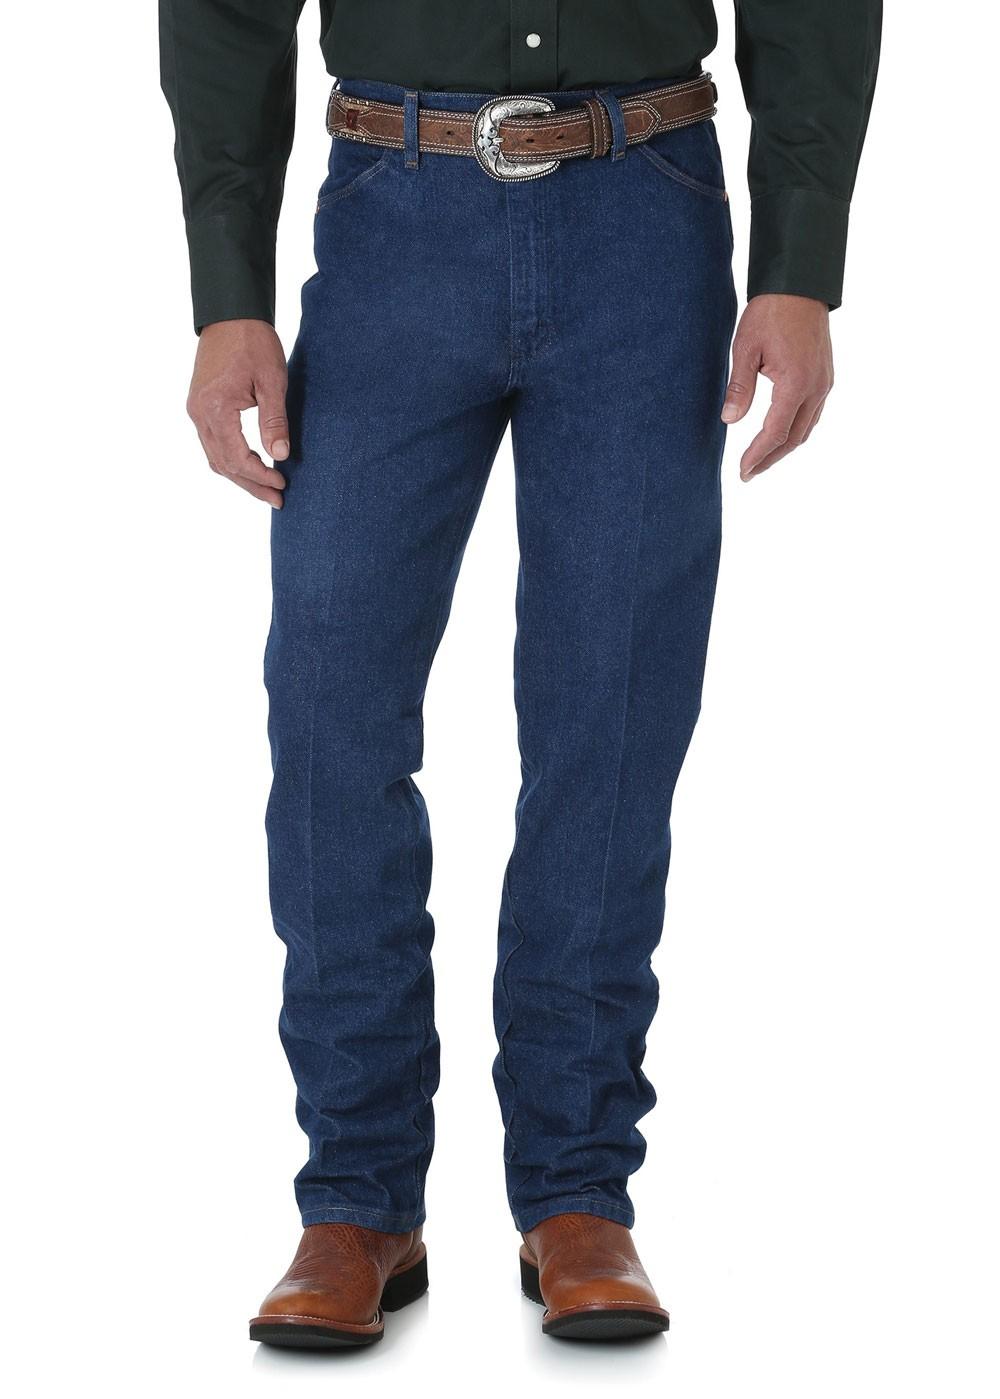 Wrangler Mens Slim Fit Cowboy Cut Jean